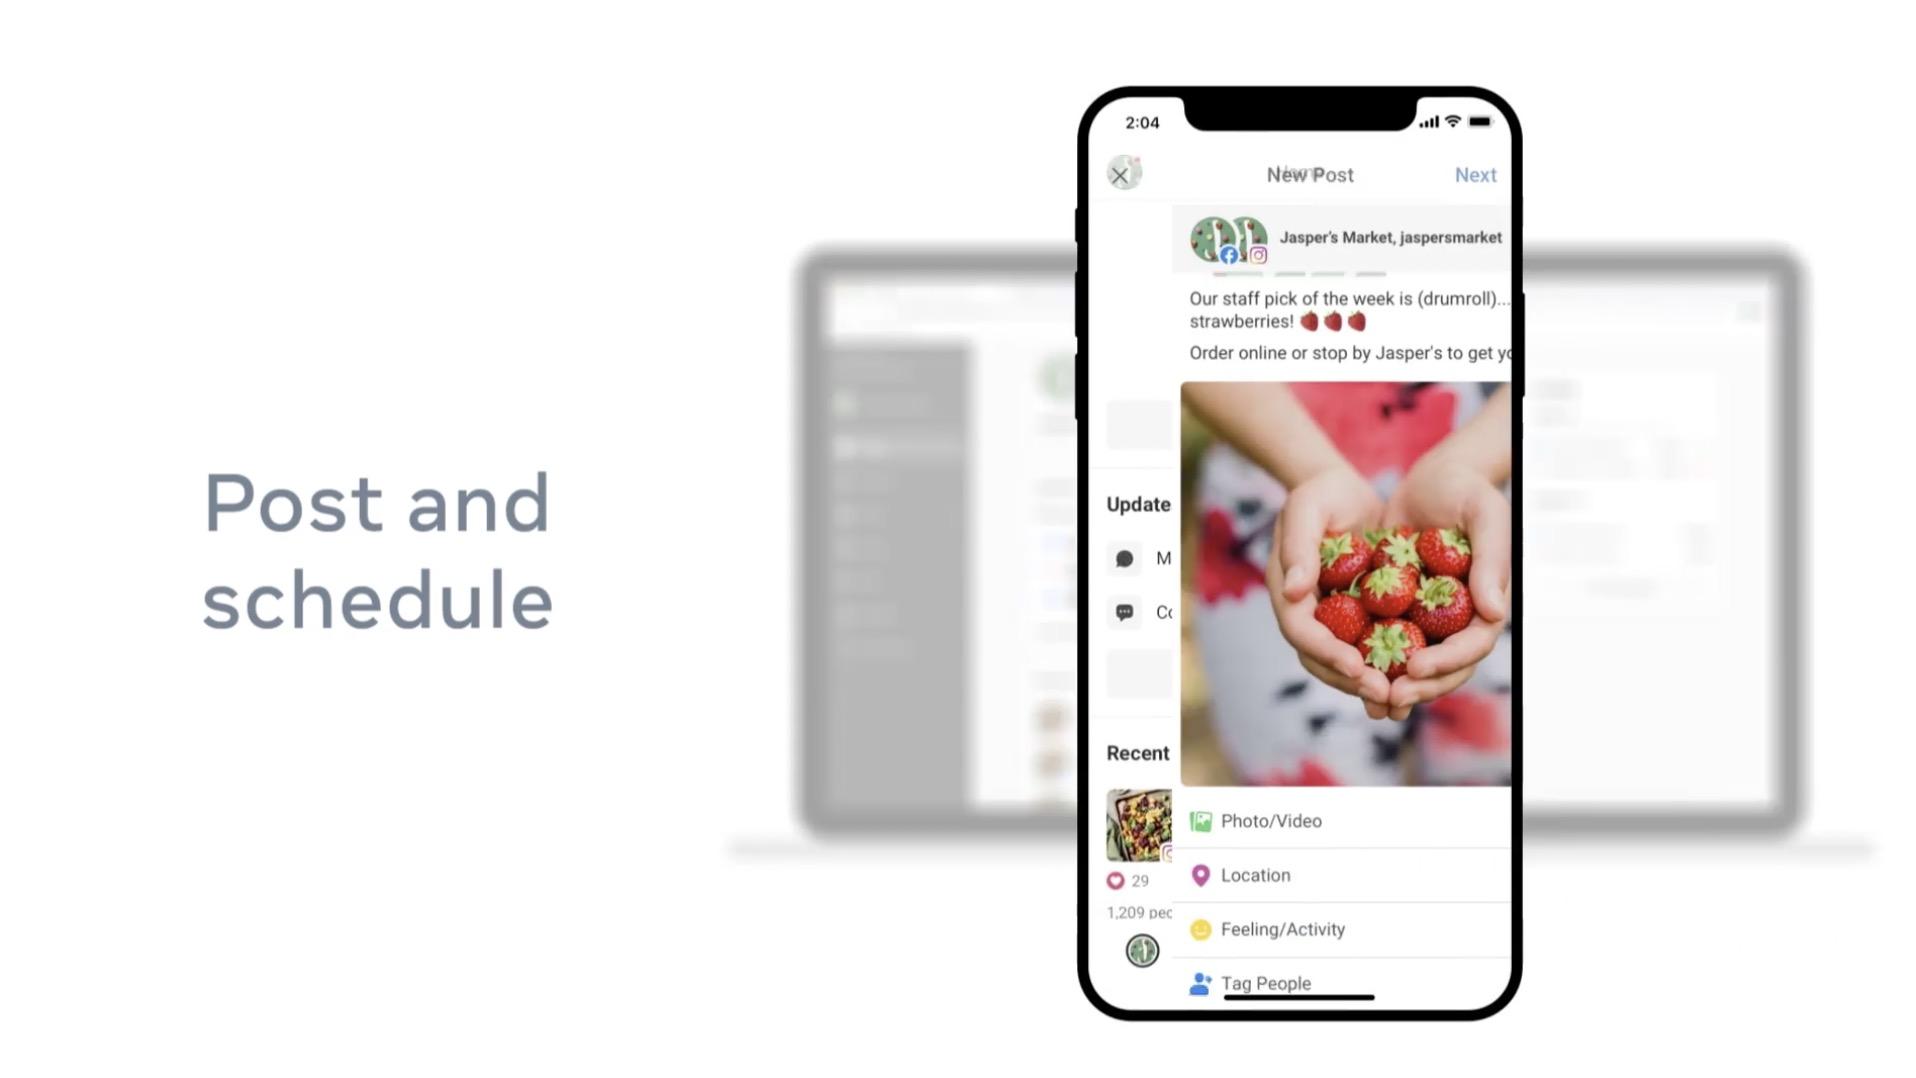 Programmare storie su Instagram con Business Suite